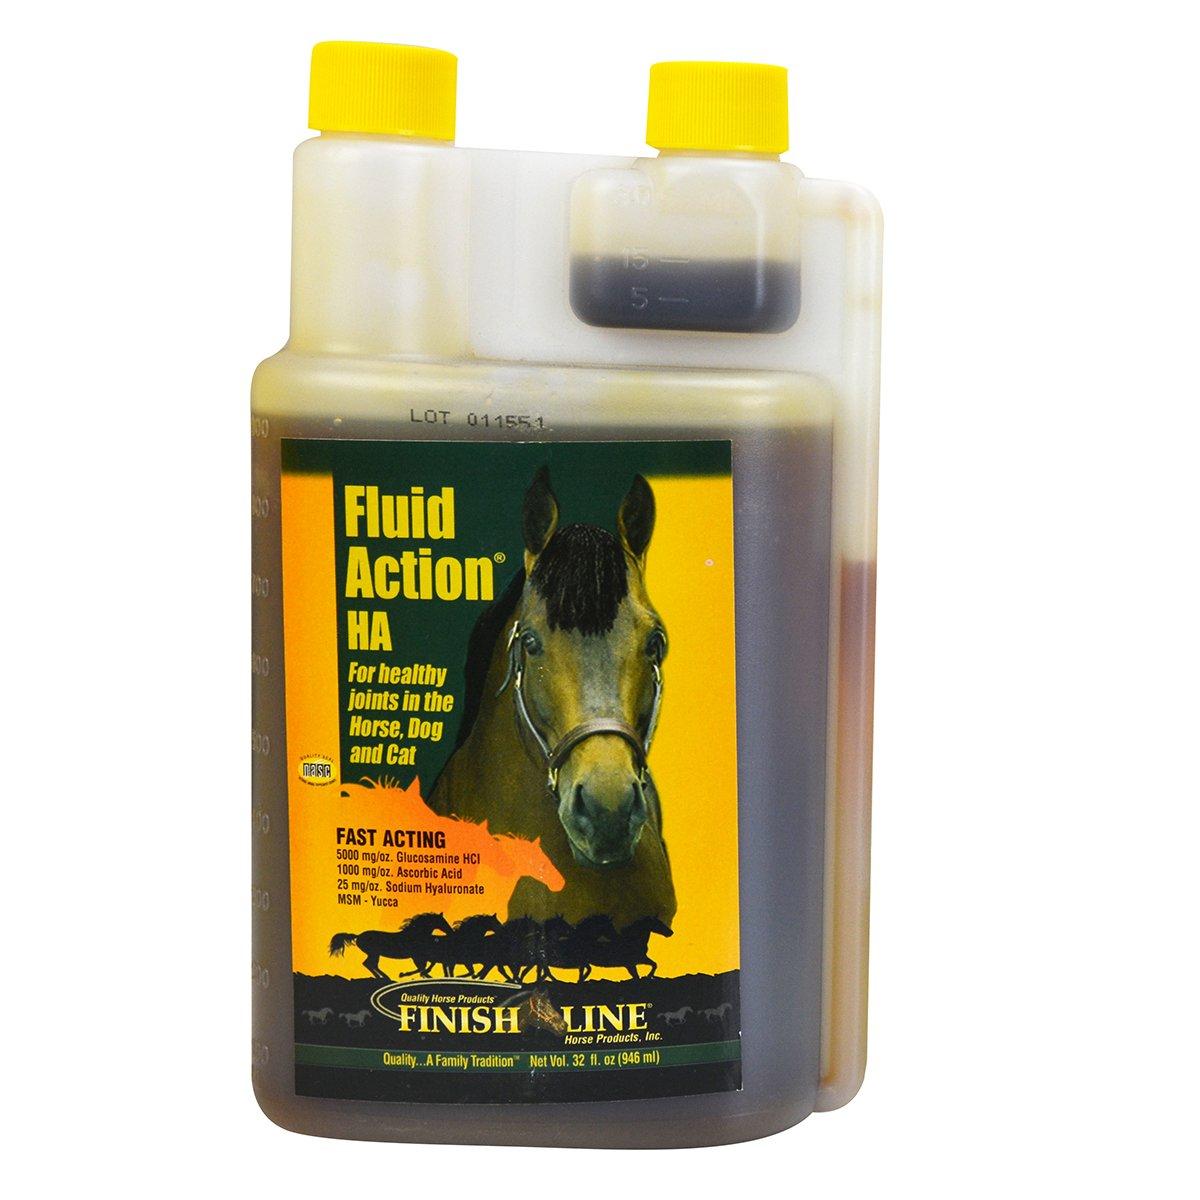 Finish Line Horse Products Fluid Action Ha Powder (Quart)